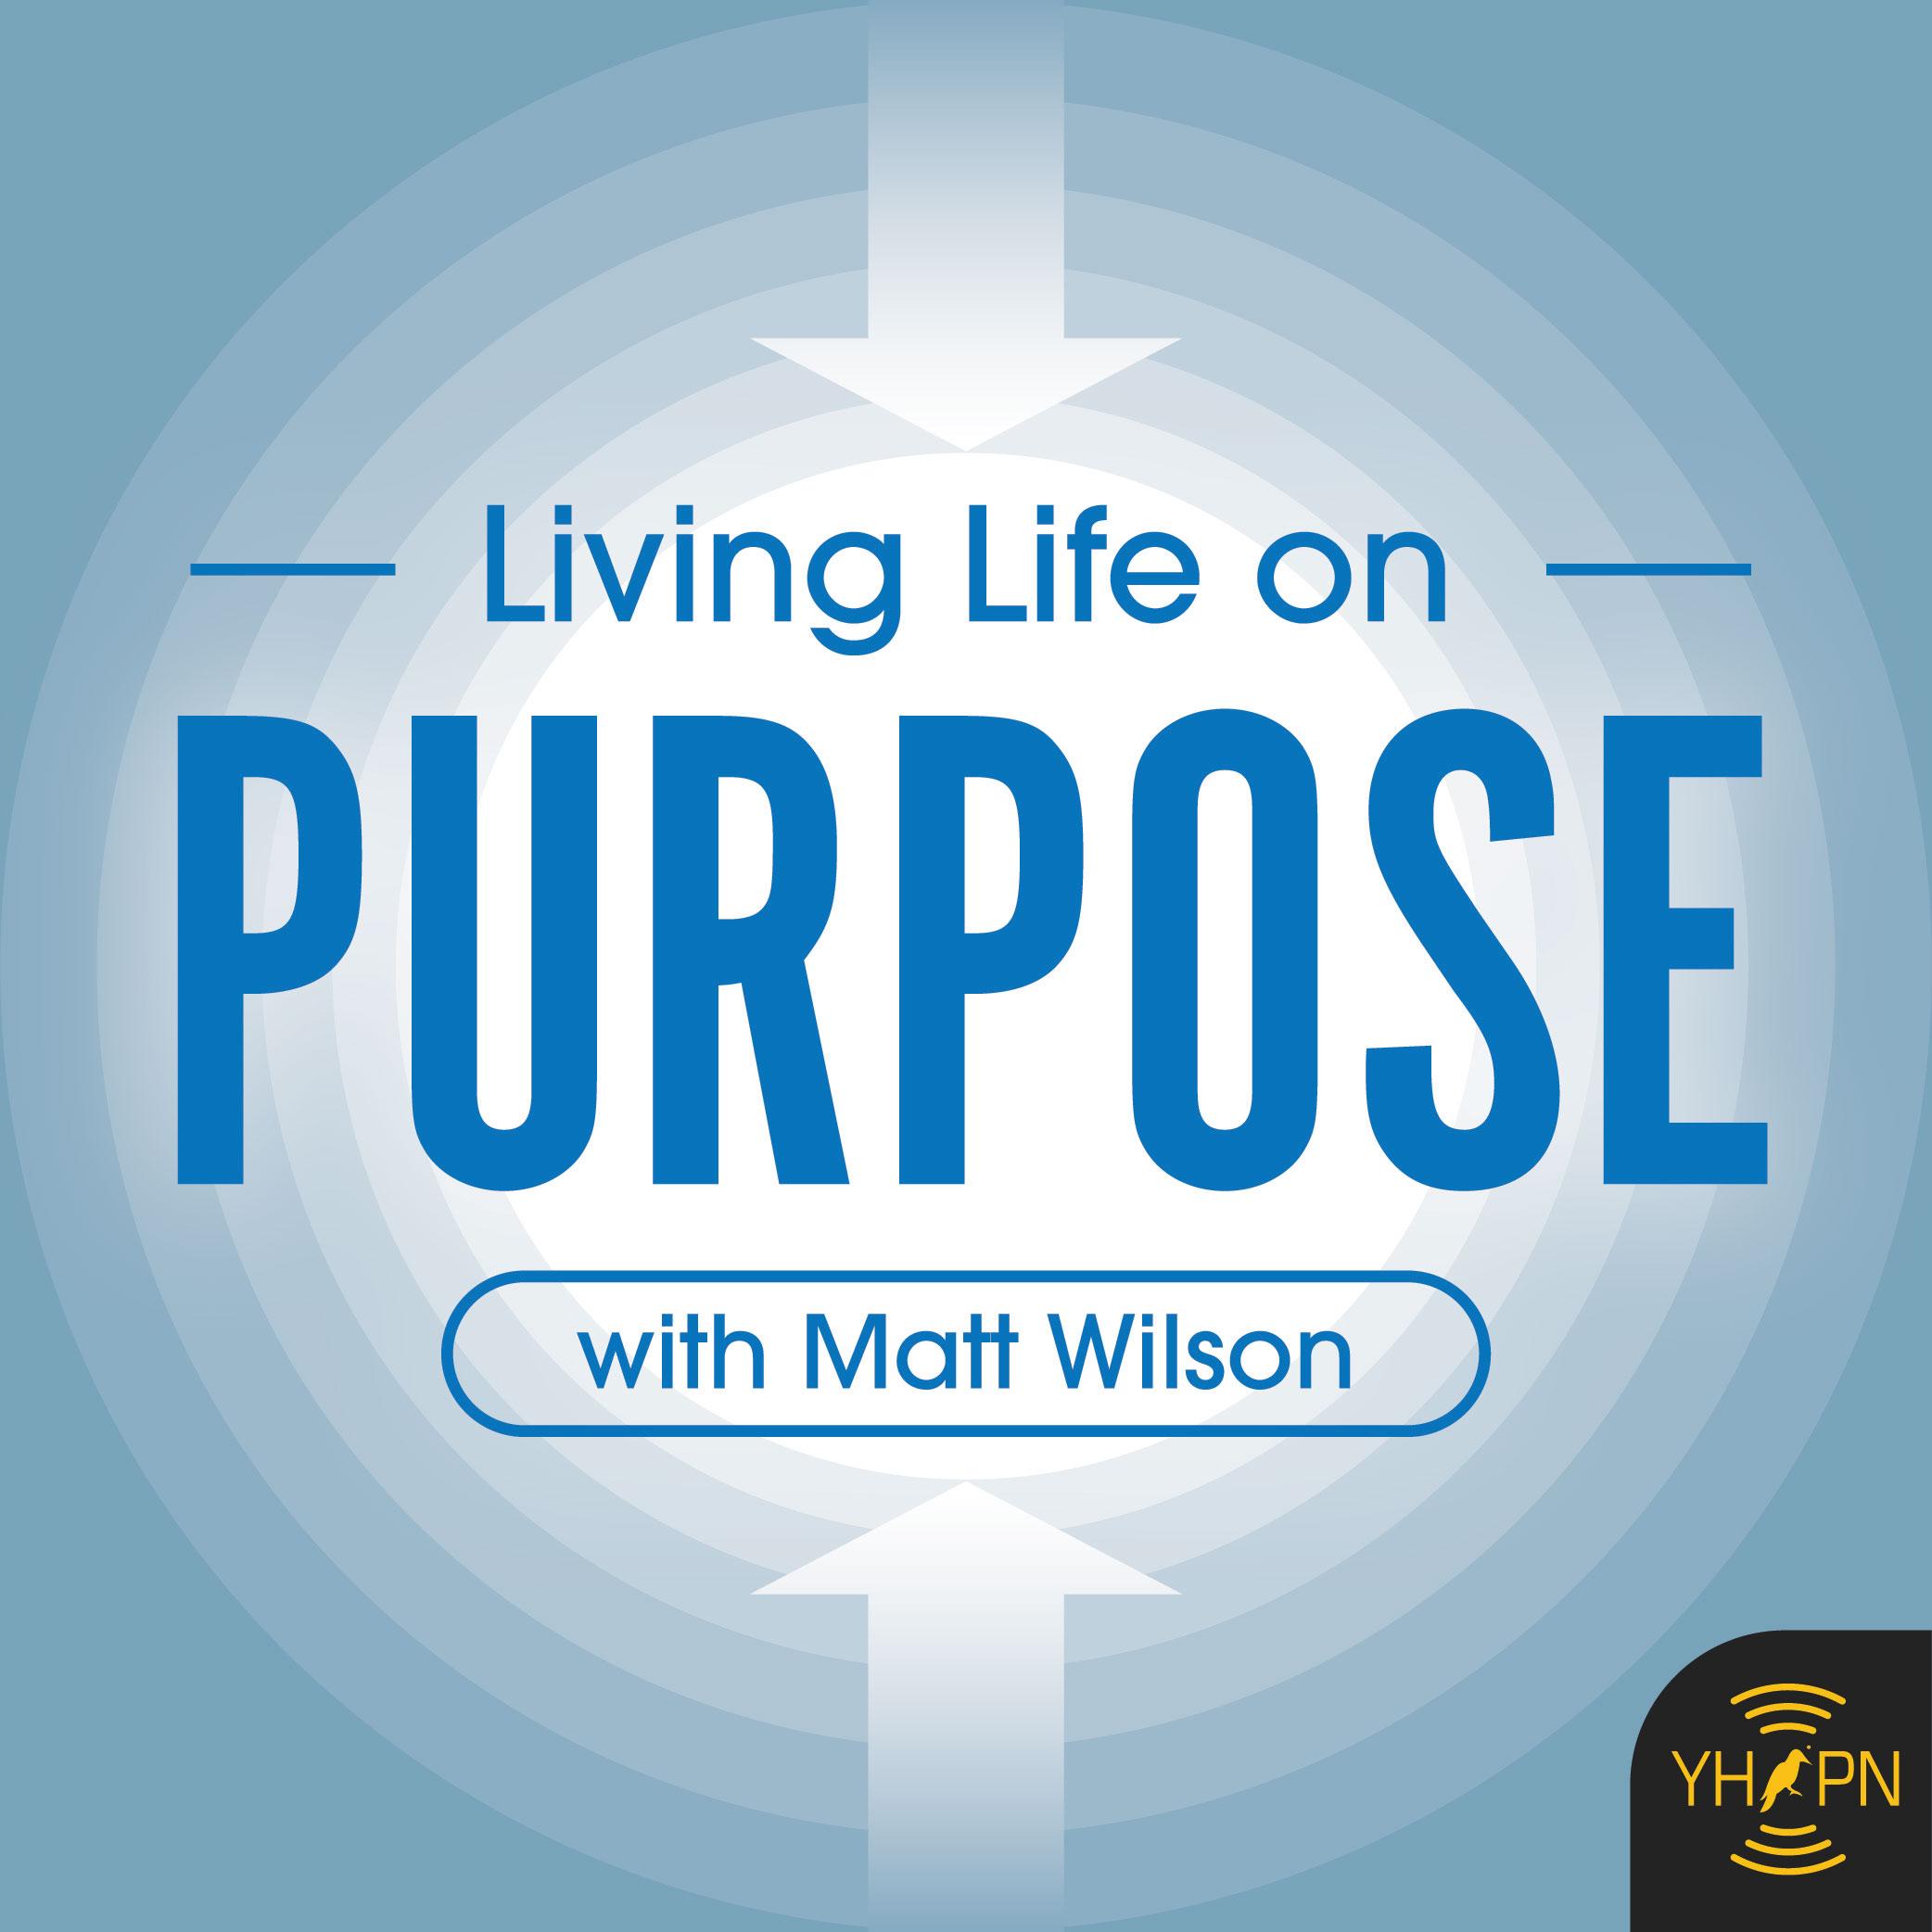 Living Life on Purpose with Matt Wilson